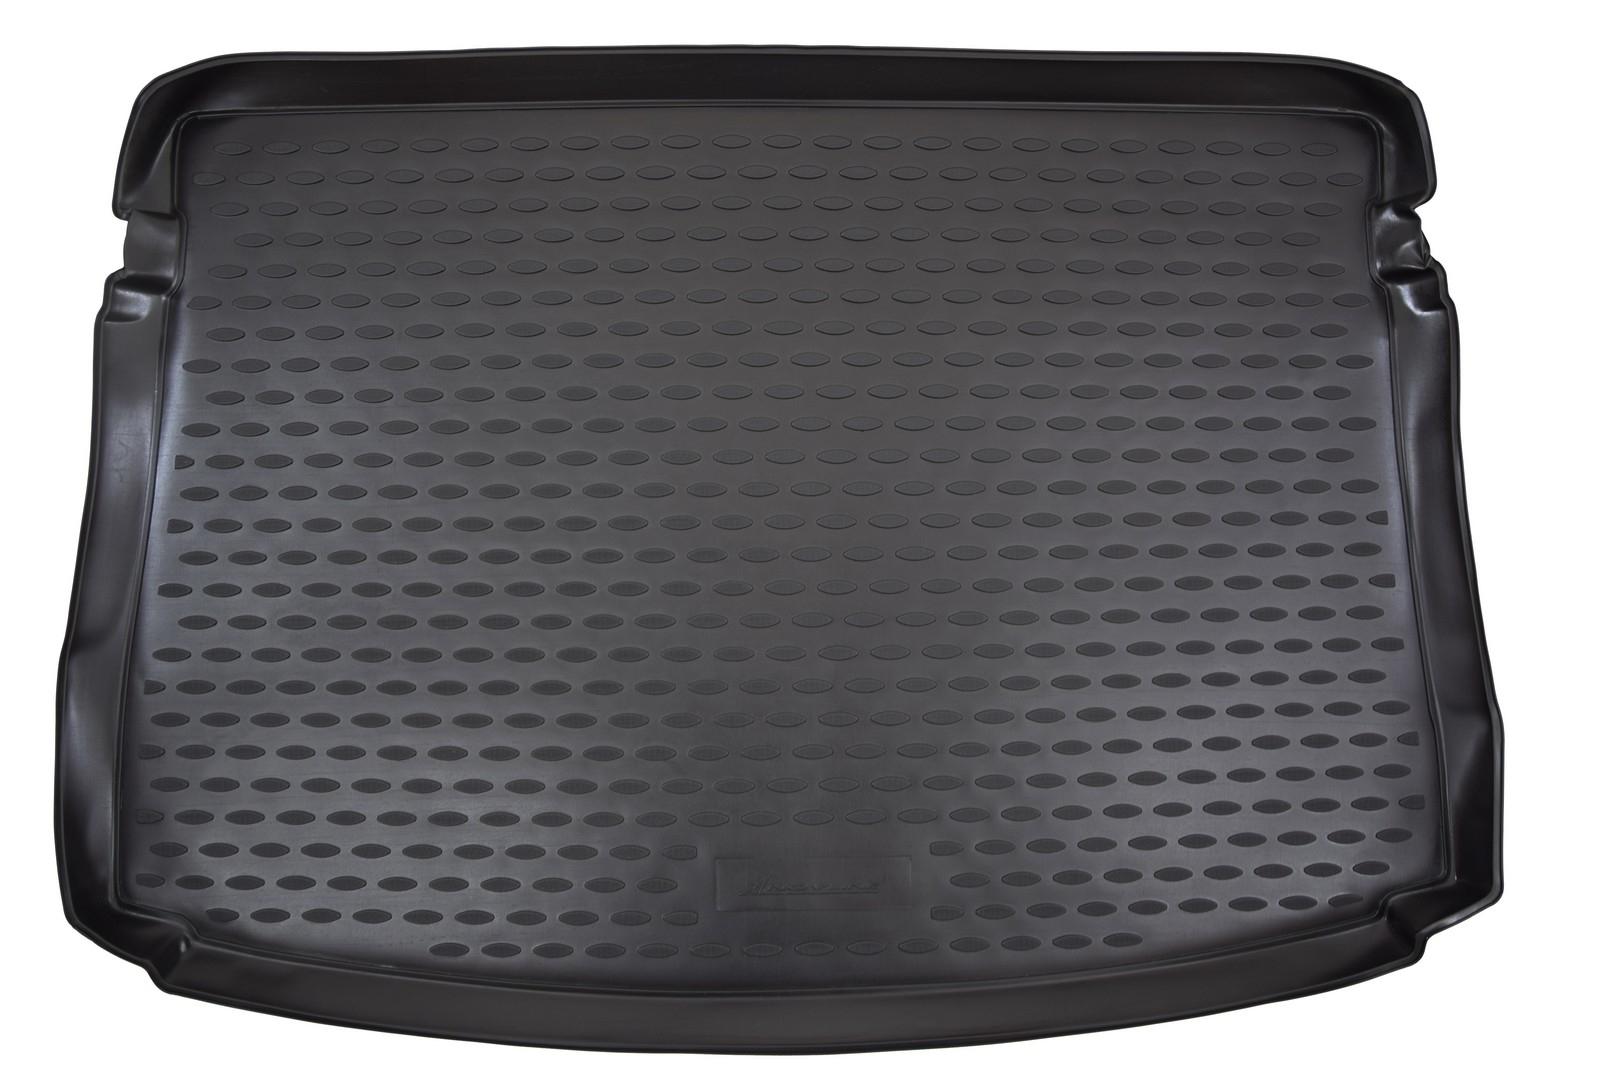 Poza cu Tavita de portbagaj Premium, Volkswagen Golf, 2012-2020